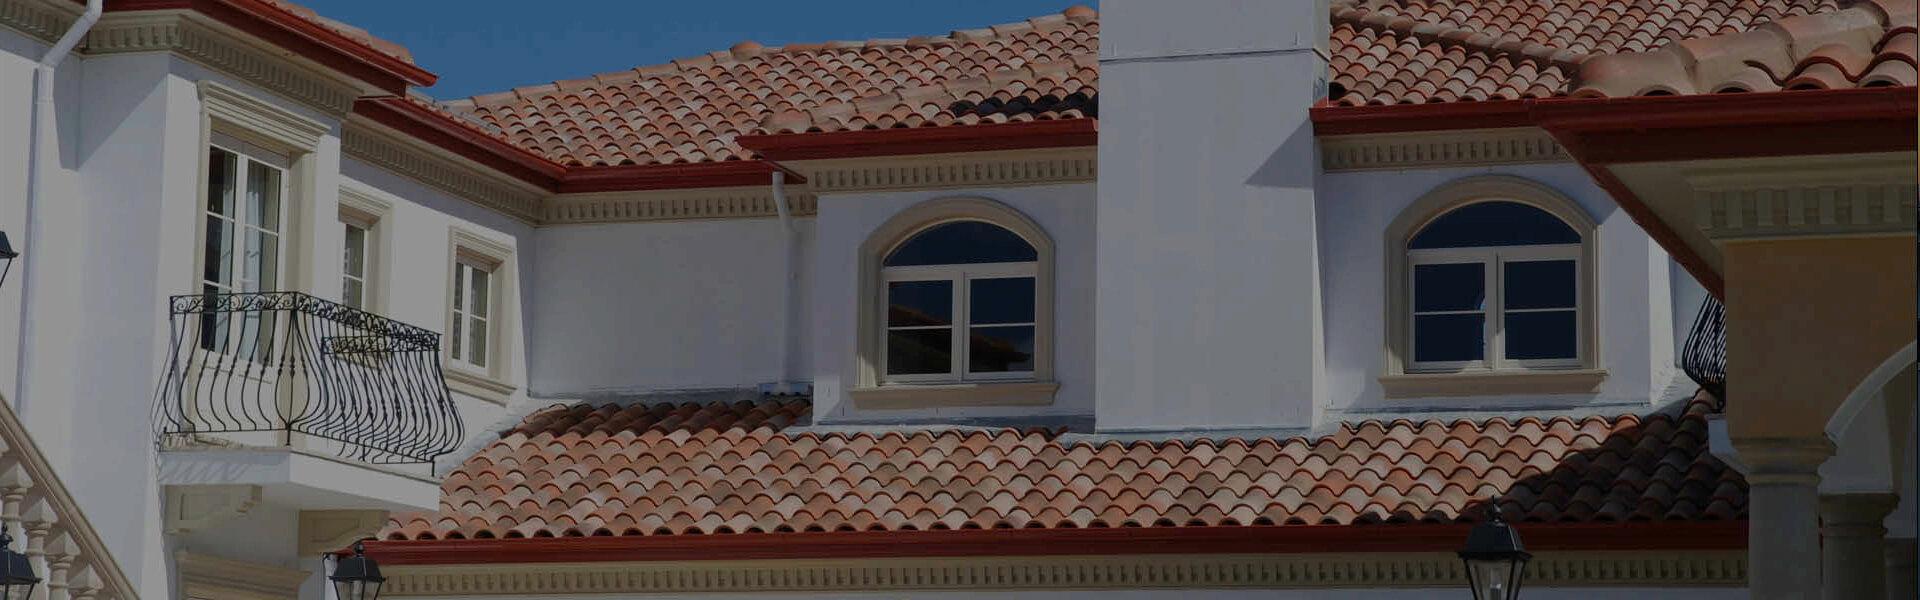 Terracotta Roof TIles - Terracotta & Concrete Roofing